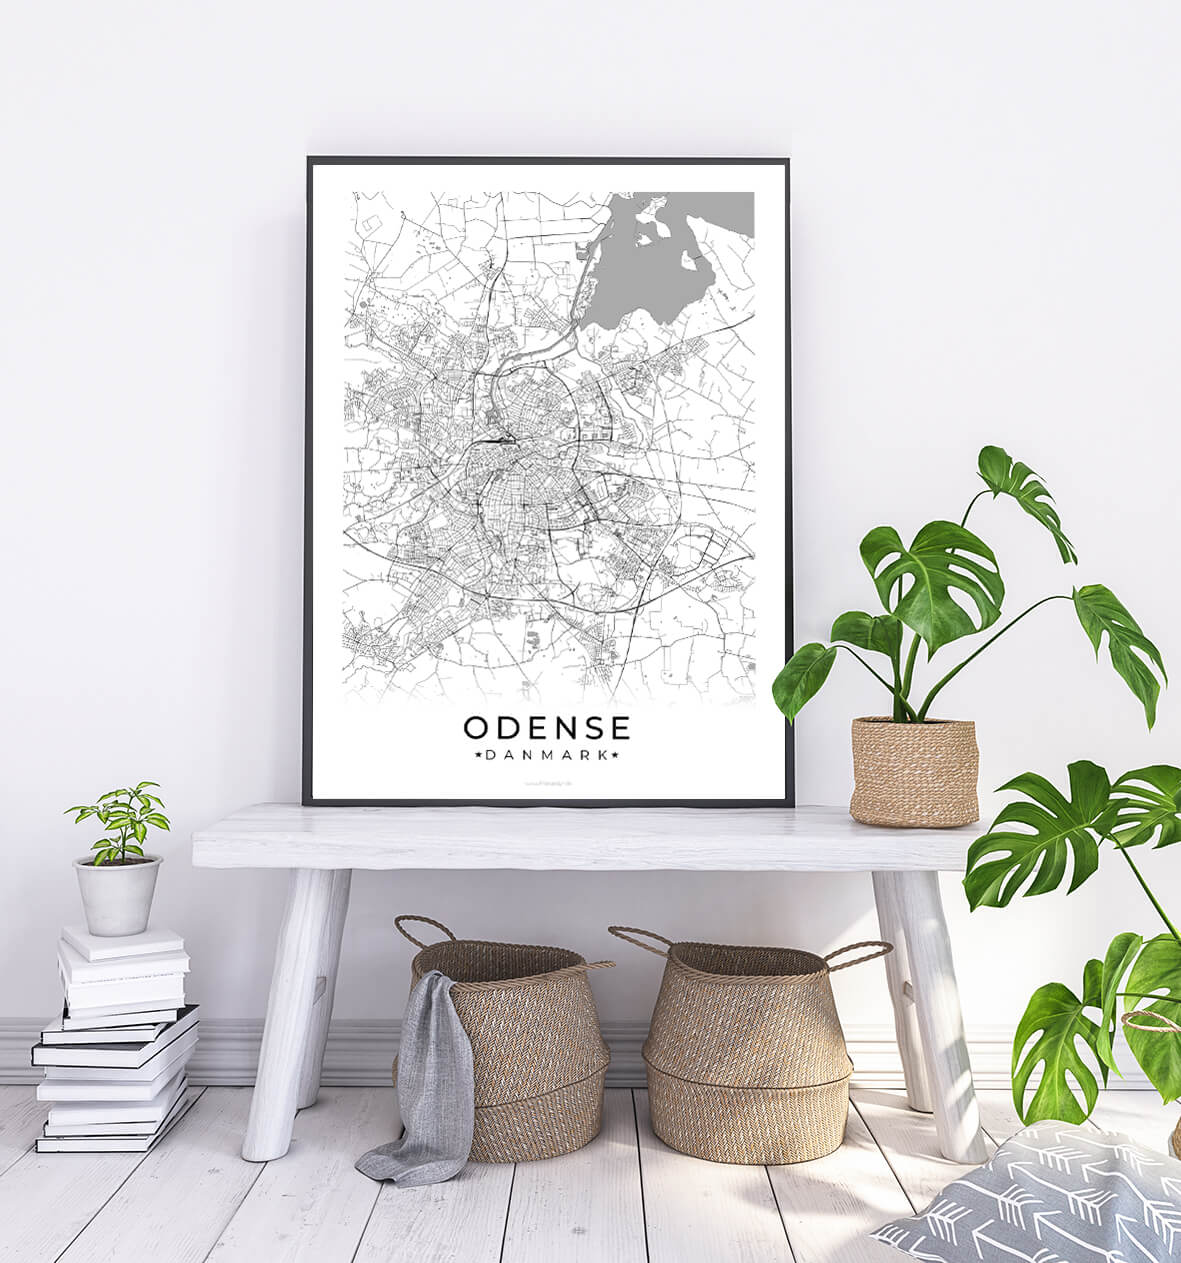 Odense-hvid-byplakat-1